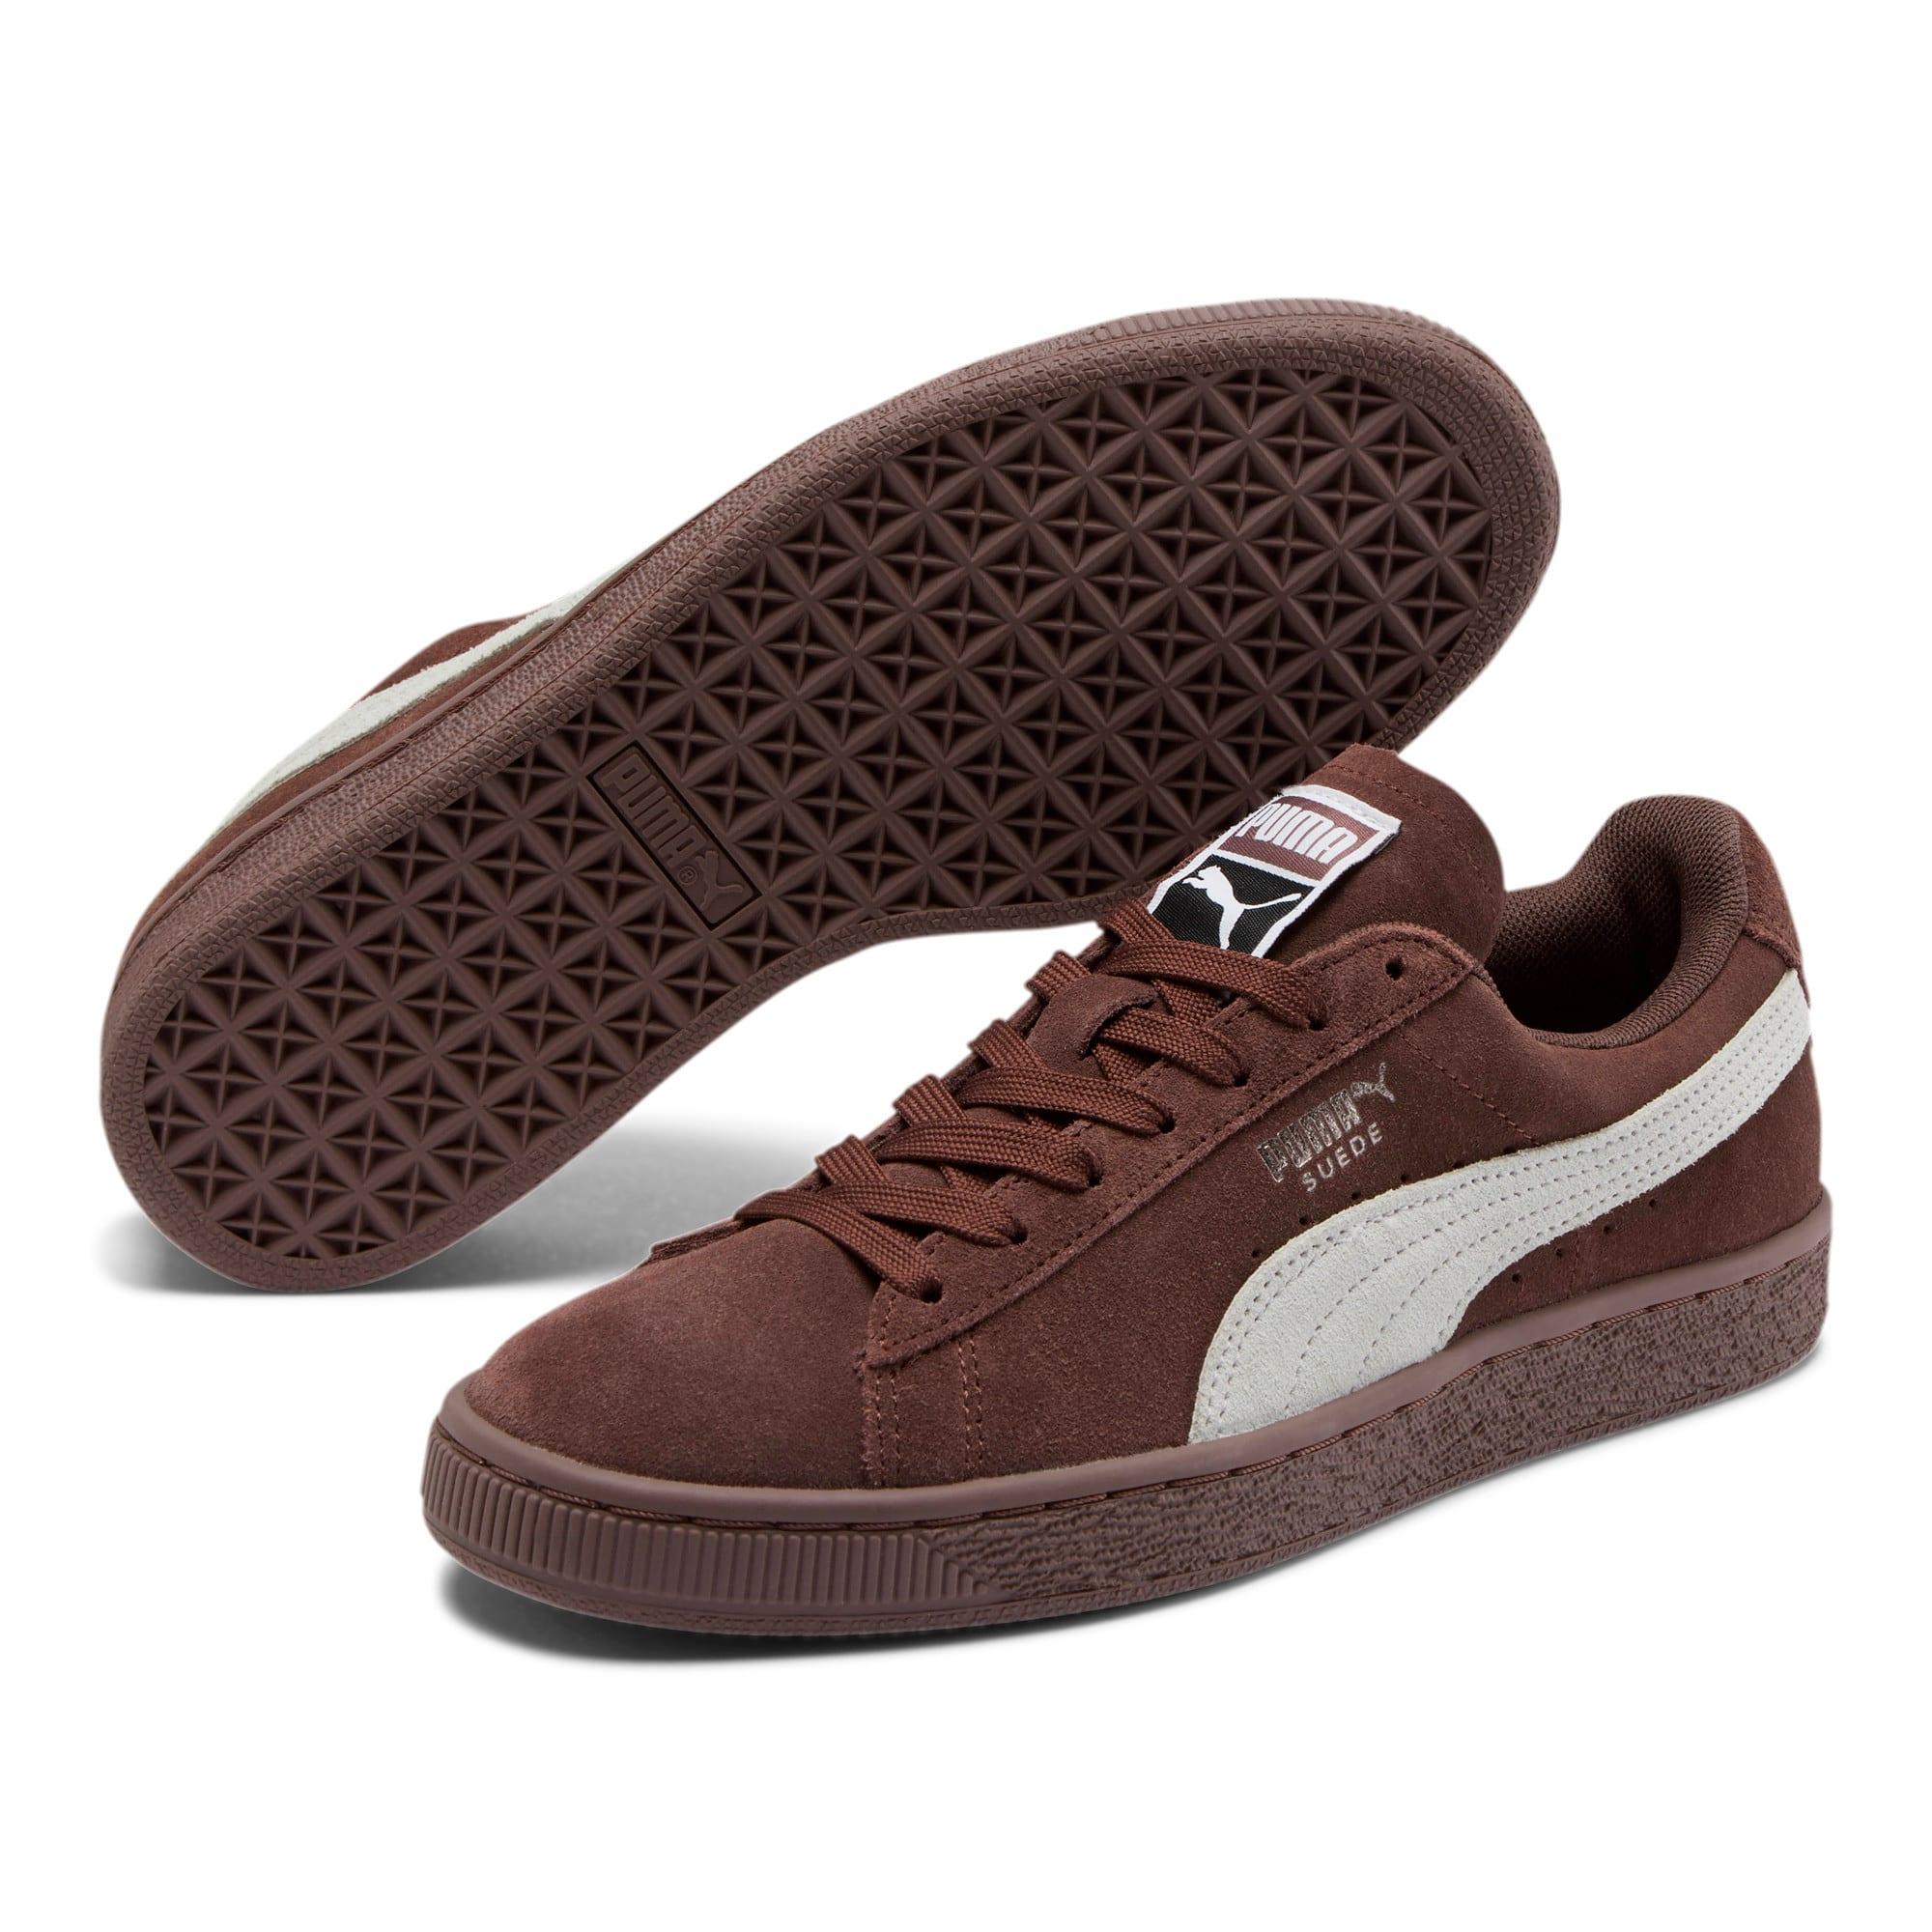 Thumbnail 2 of Suede Classic Women's Sneakers, Peppercorn-Puma White, medium